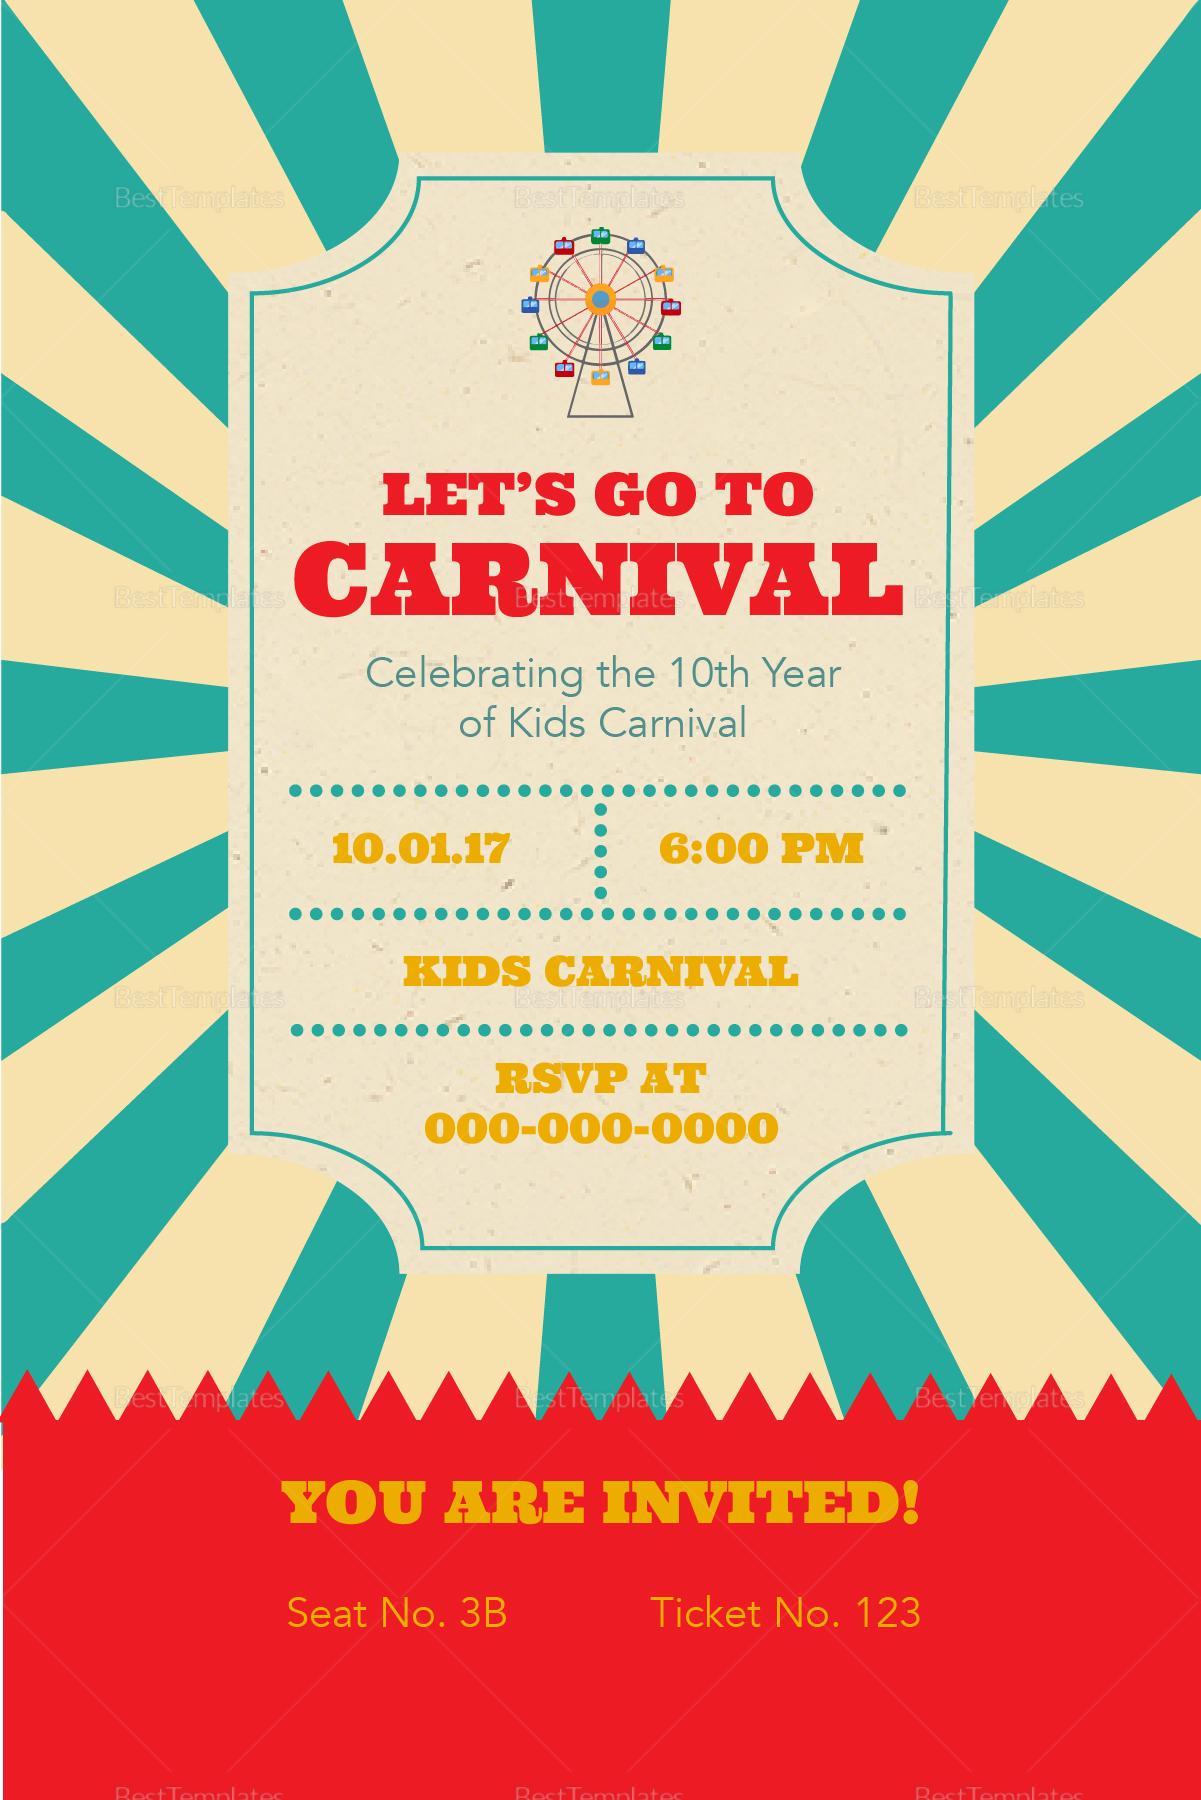 carnival ticket invitation design template in psd word. Black Bedroom Furniture Sets. Home Design Ideas